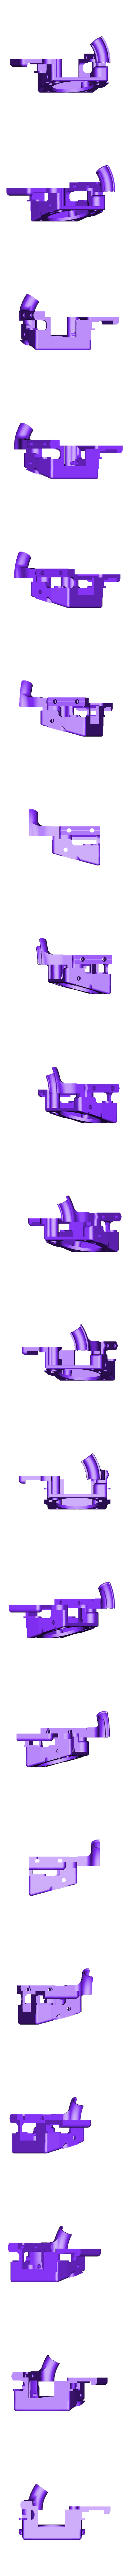 base.stl Download free STL file Petsfang Micrometer Adapter • 3D print model, Pipapelaa